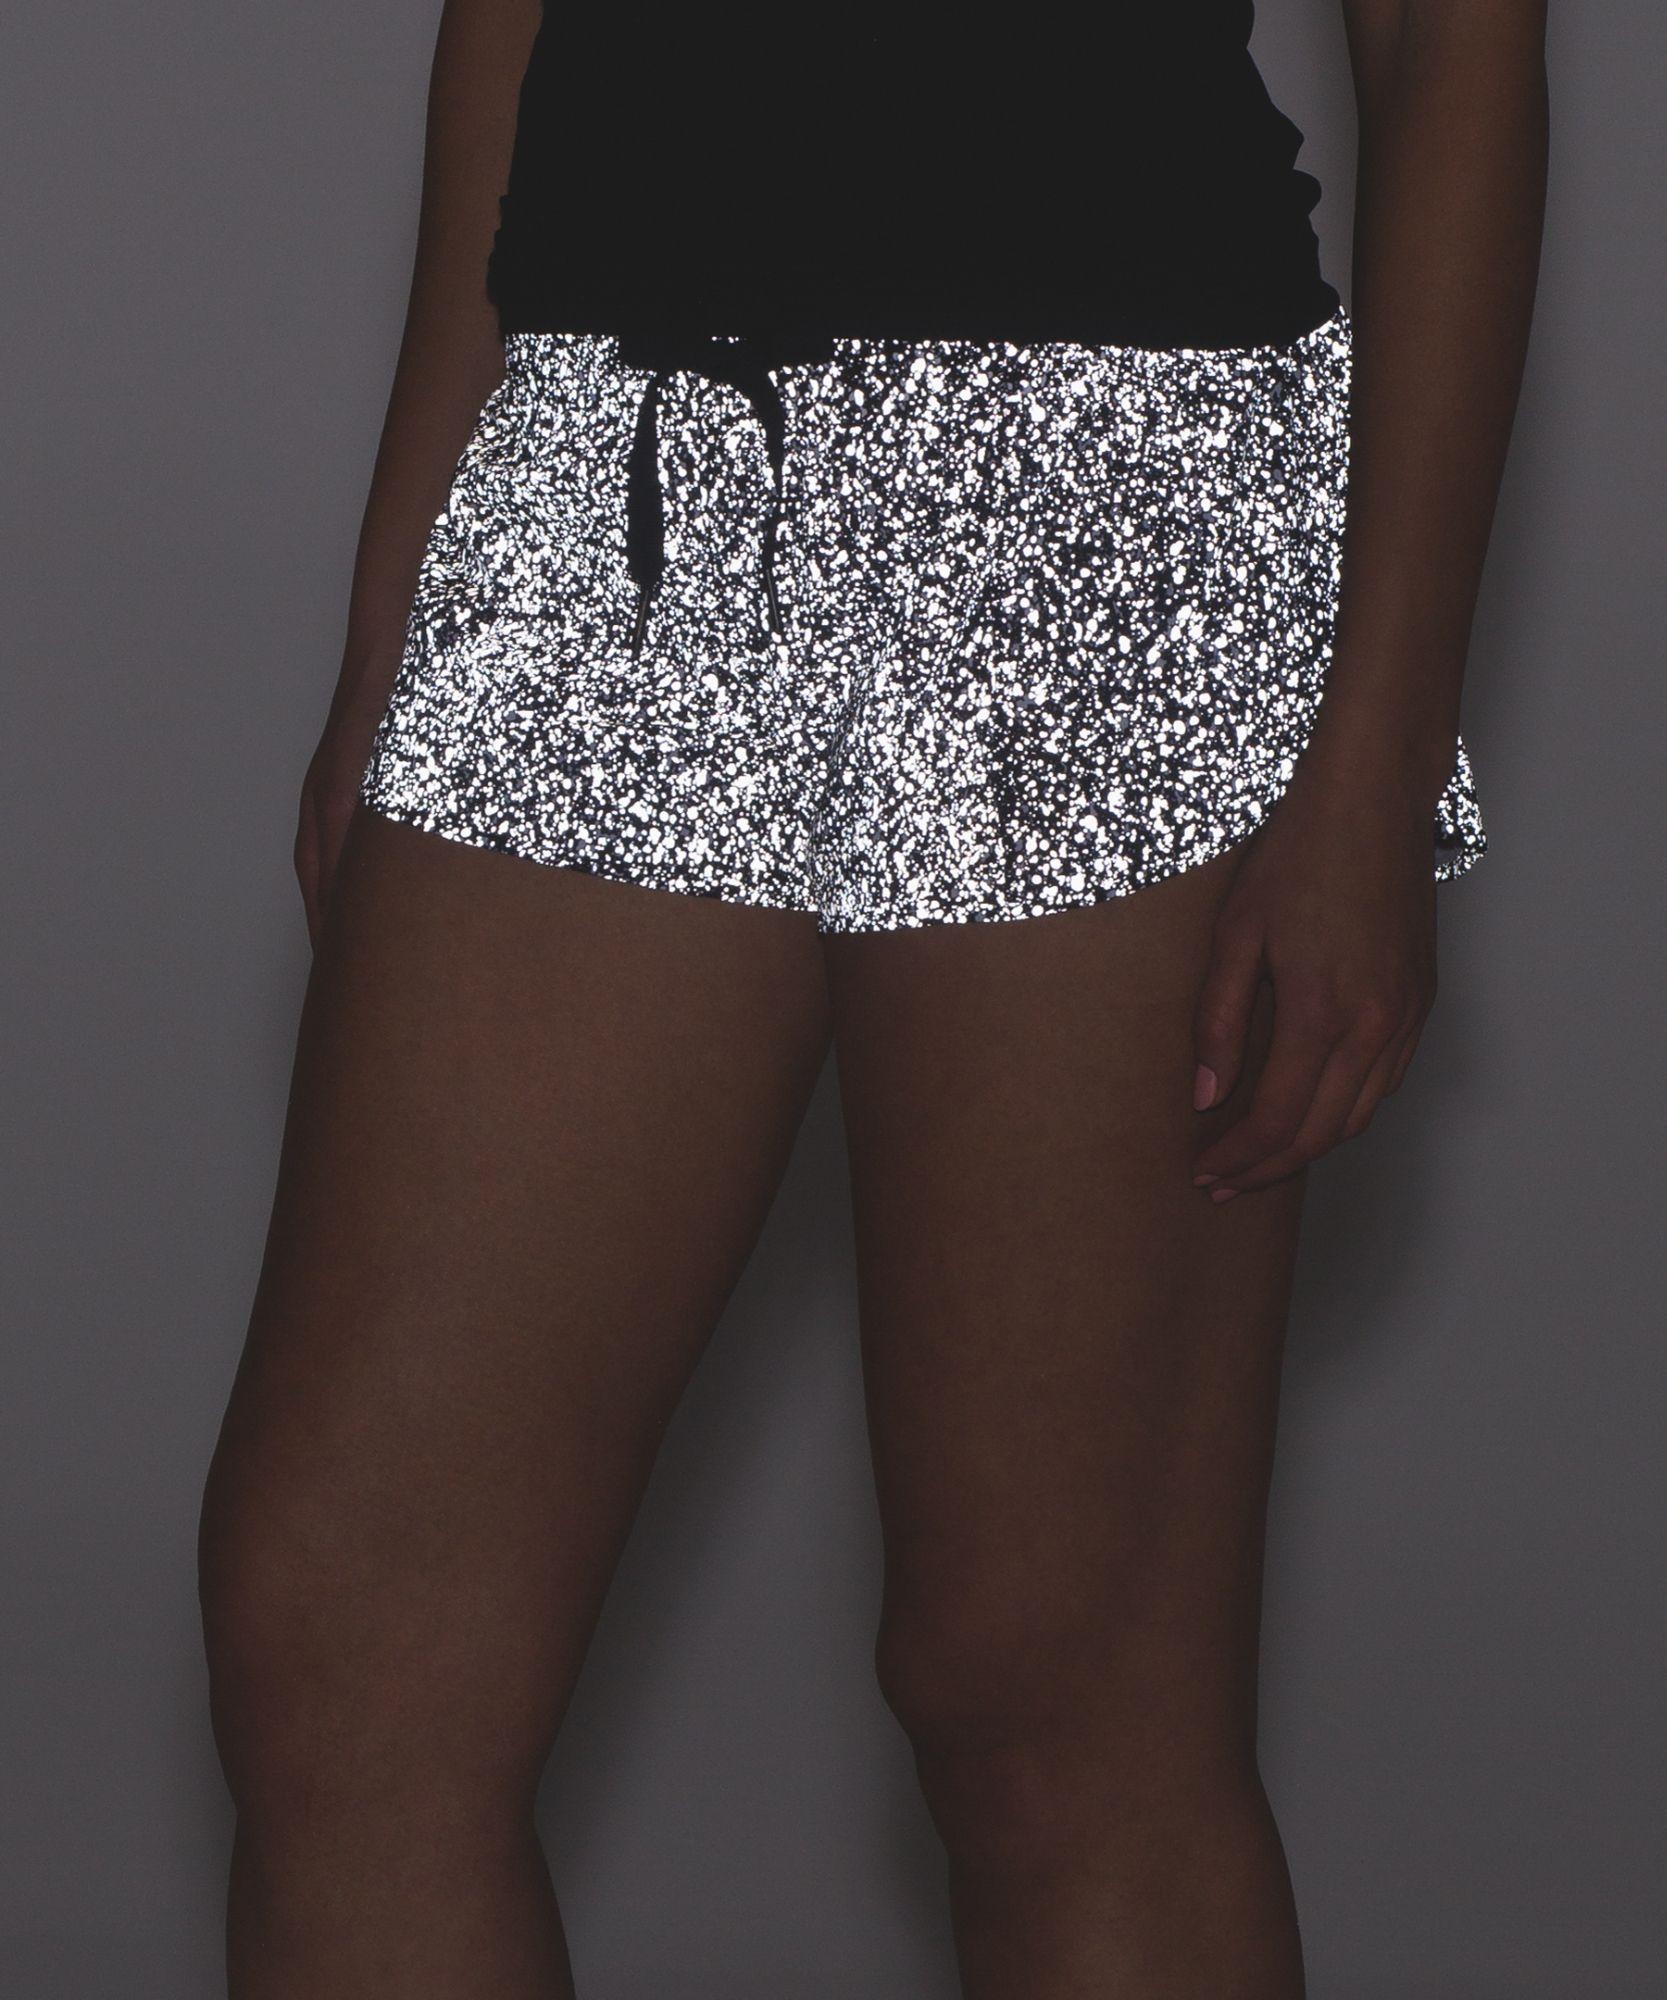 8aea5a741c5 Hotty Hot Short (Splatter) *Reflective | Women's Shorts | lululemon  athletica